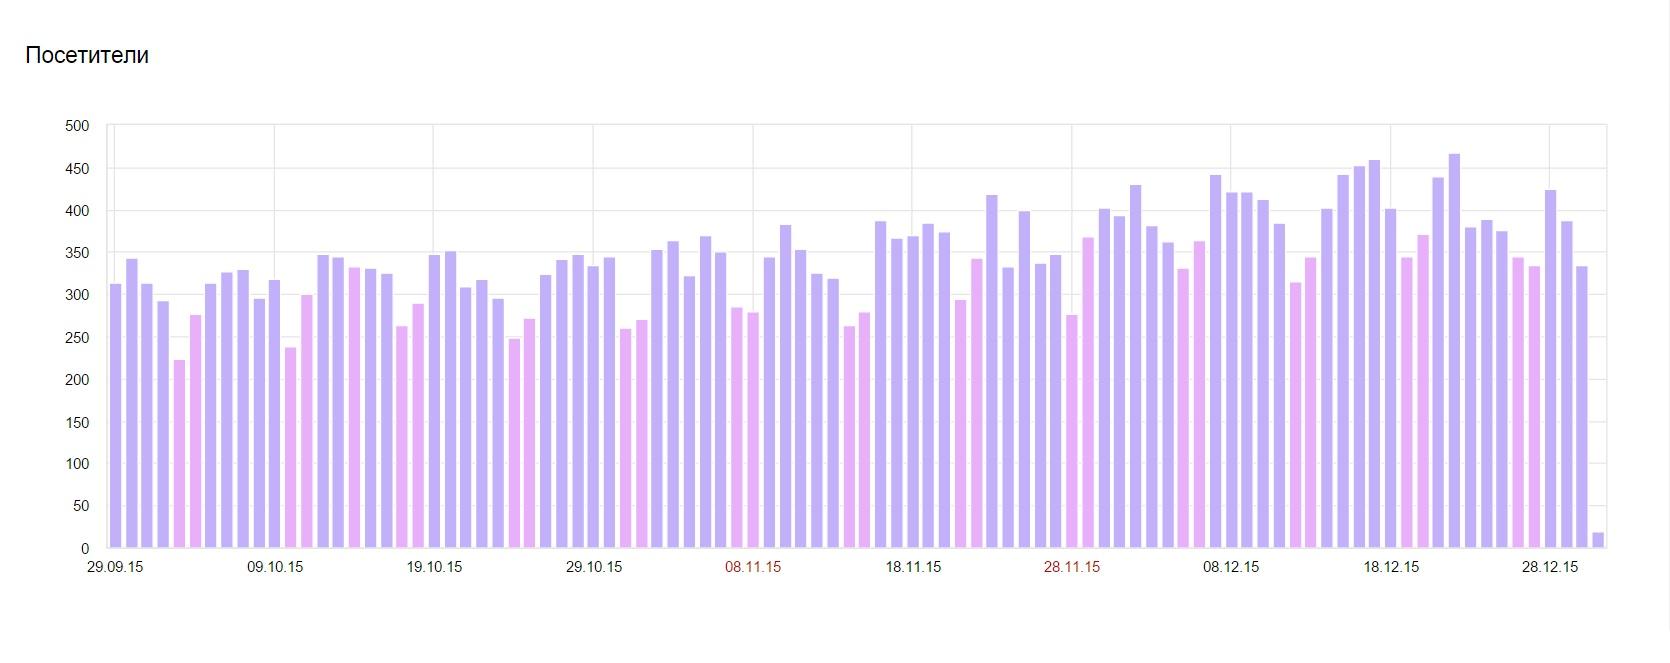 Статистика посещаемости по дням